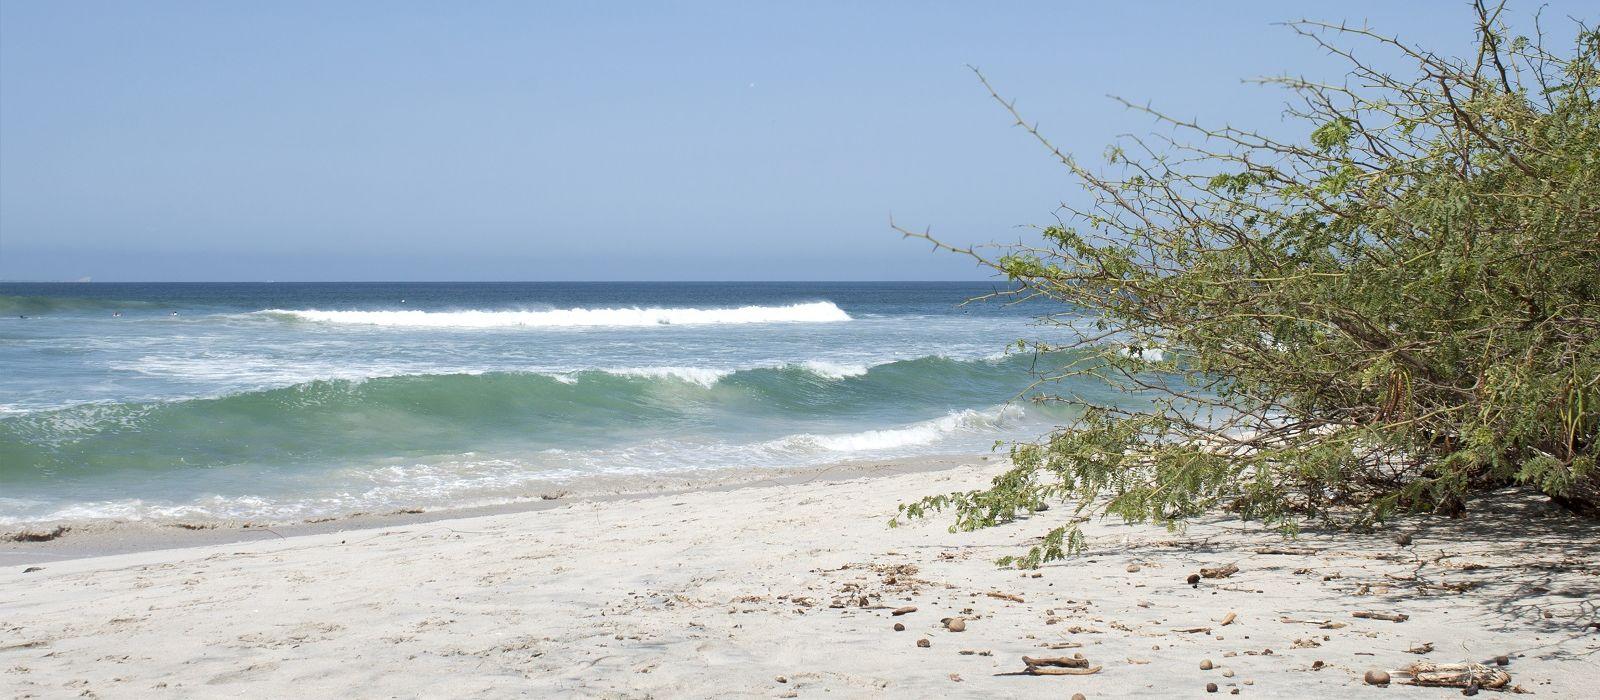 Mexikos koloniale Schätze & Strand Urlaub 4